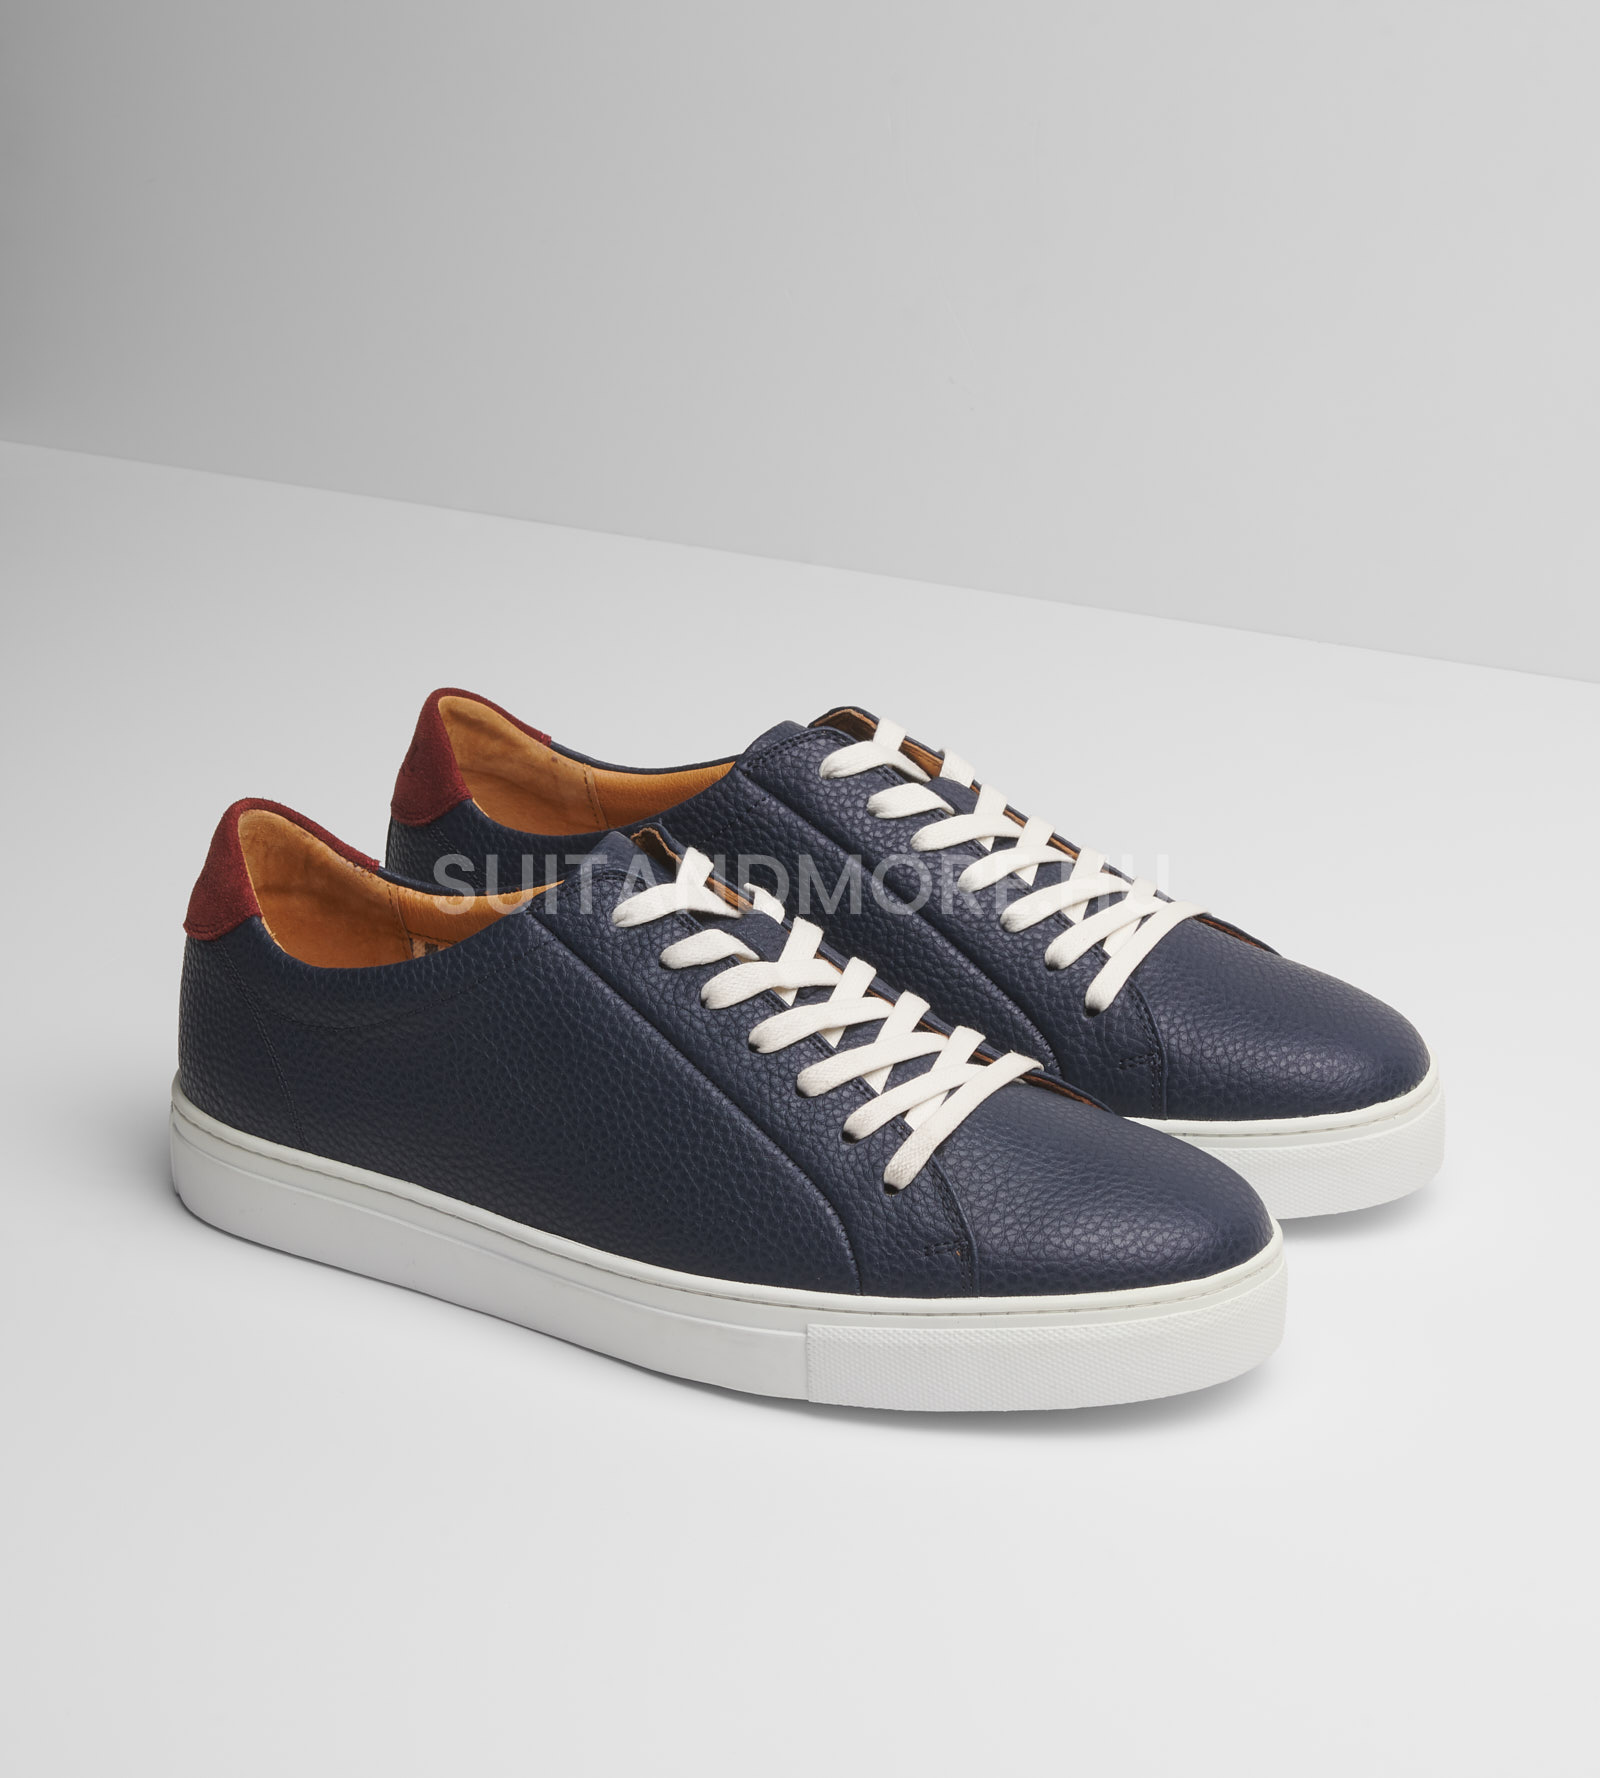 digel-kek-sneaker-cipo-seth-1289704-20-01